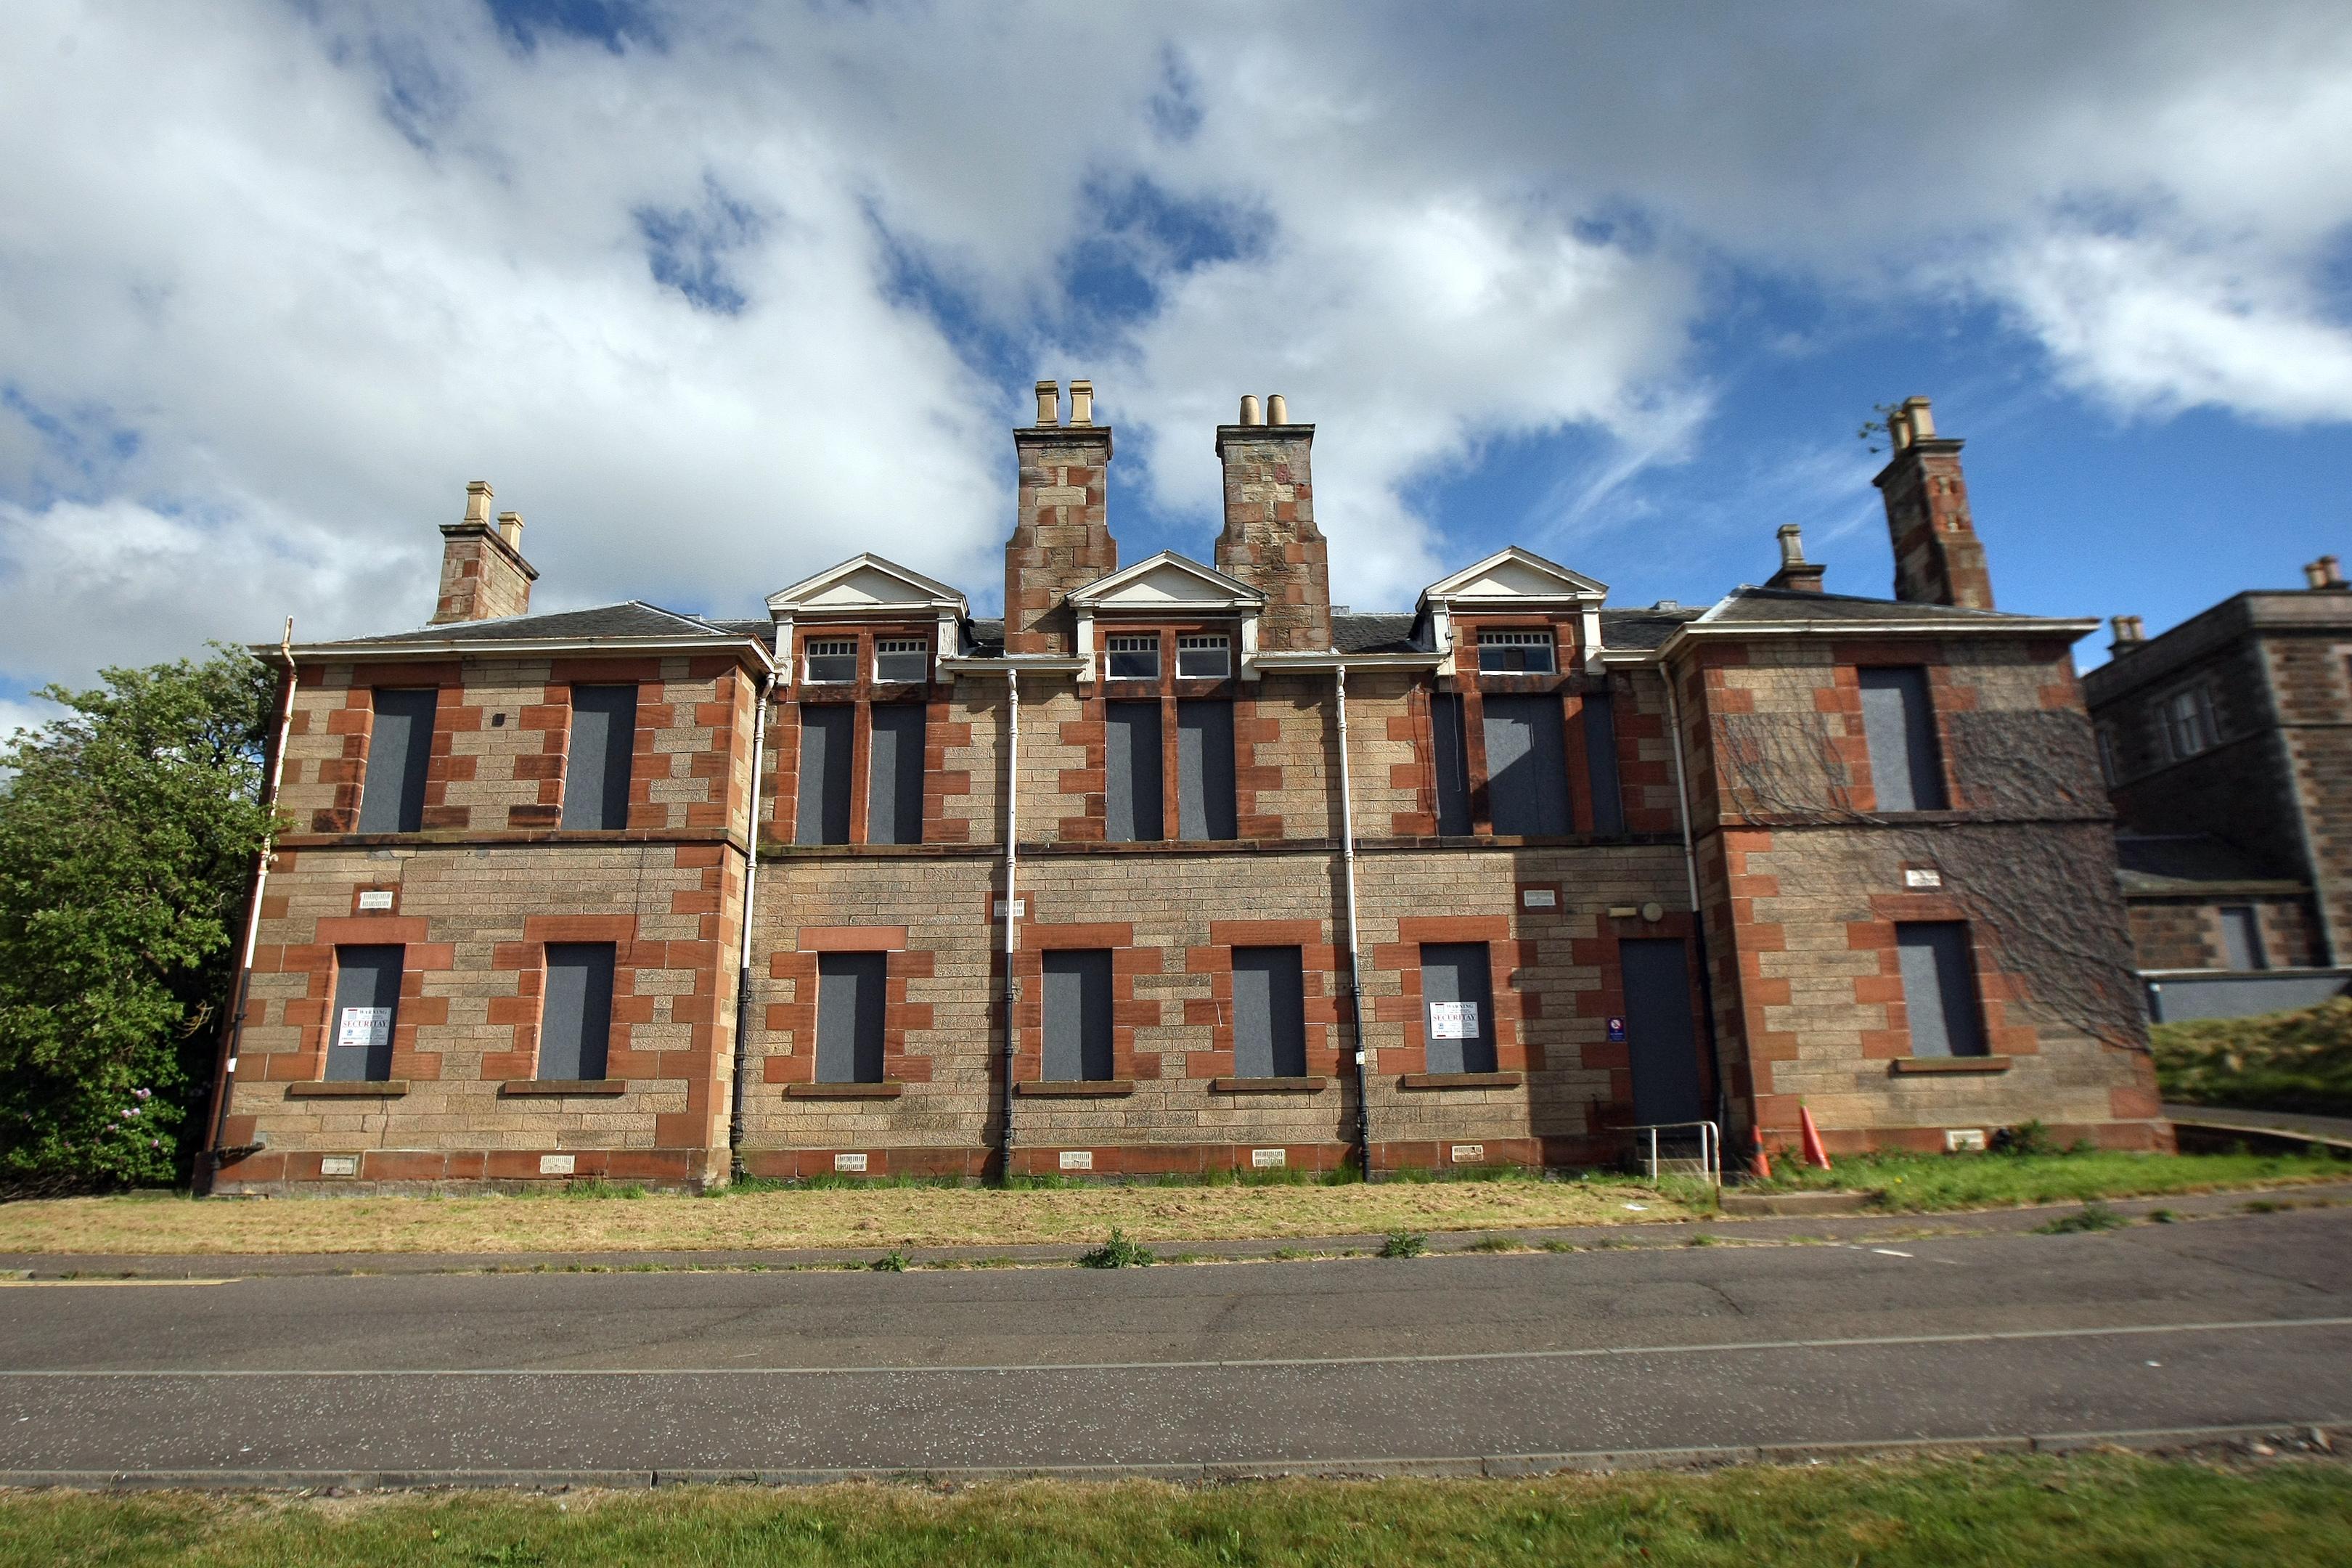 The old Murray Royal Hospital buildings.